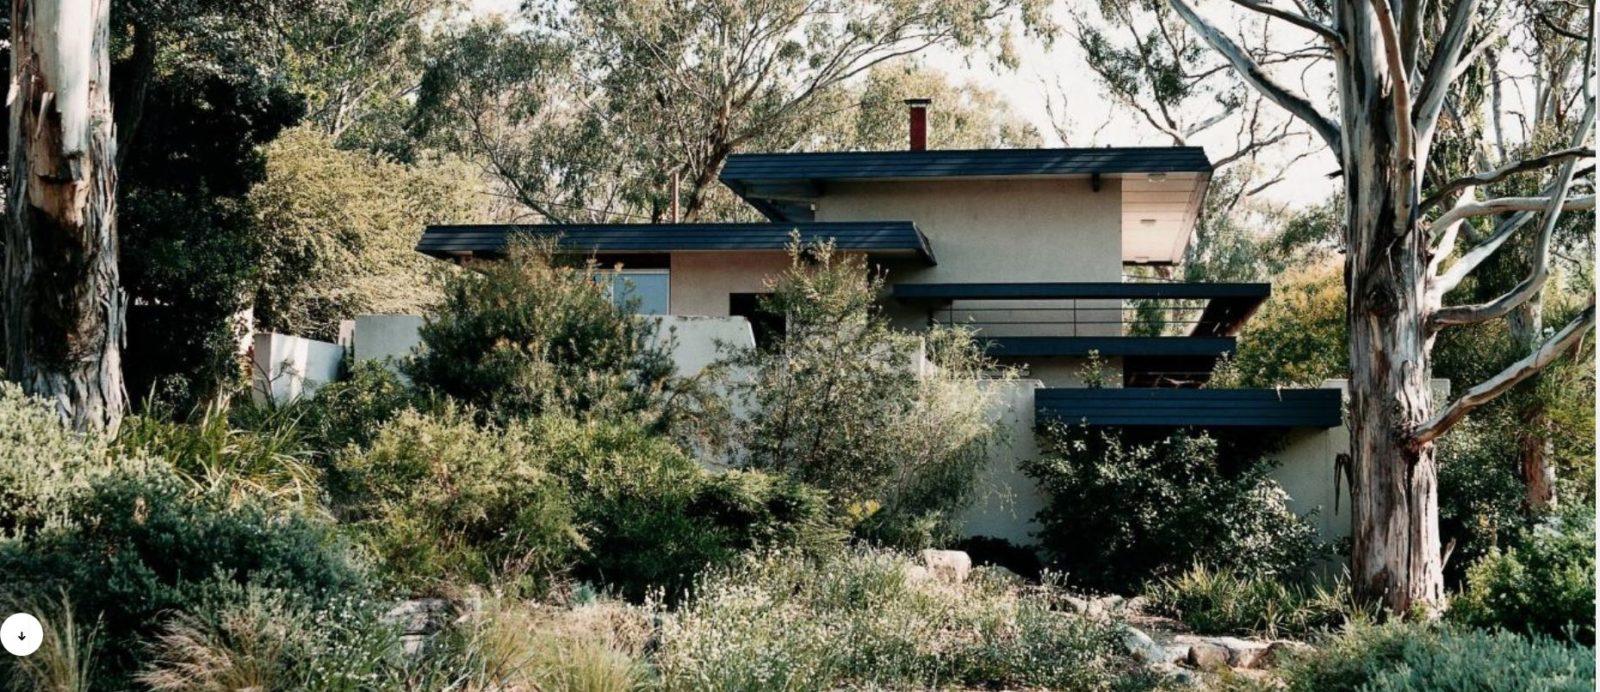 Enrico Taglietti, Dingle House. Photo: Michael Wee